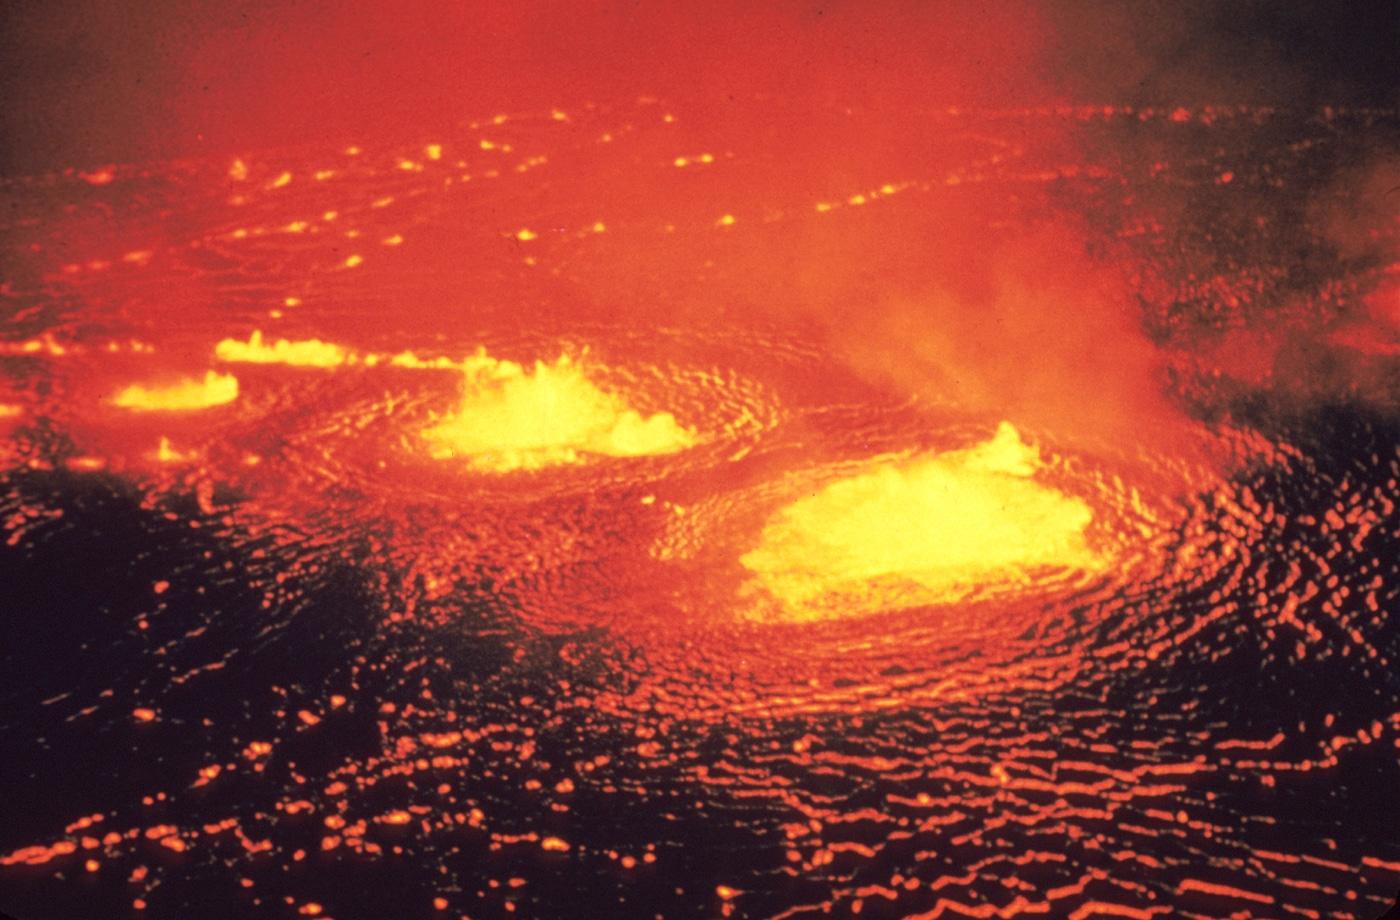 Vulcanul Kilauea, cel mai activ vulcan din lume